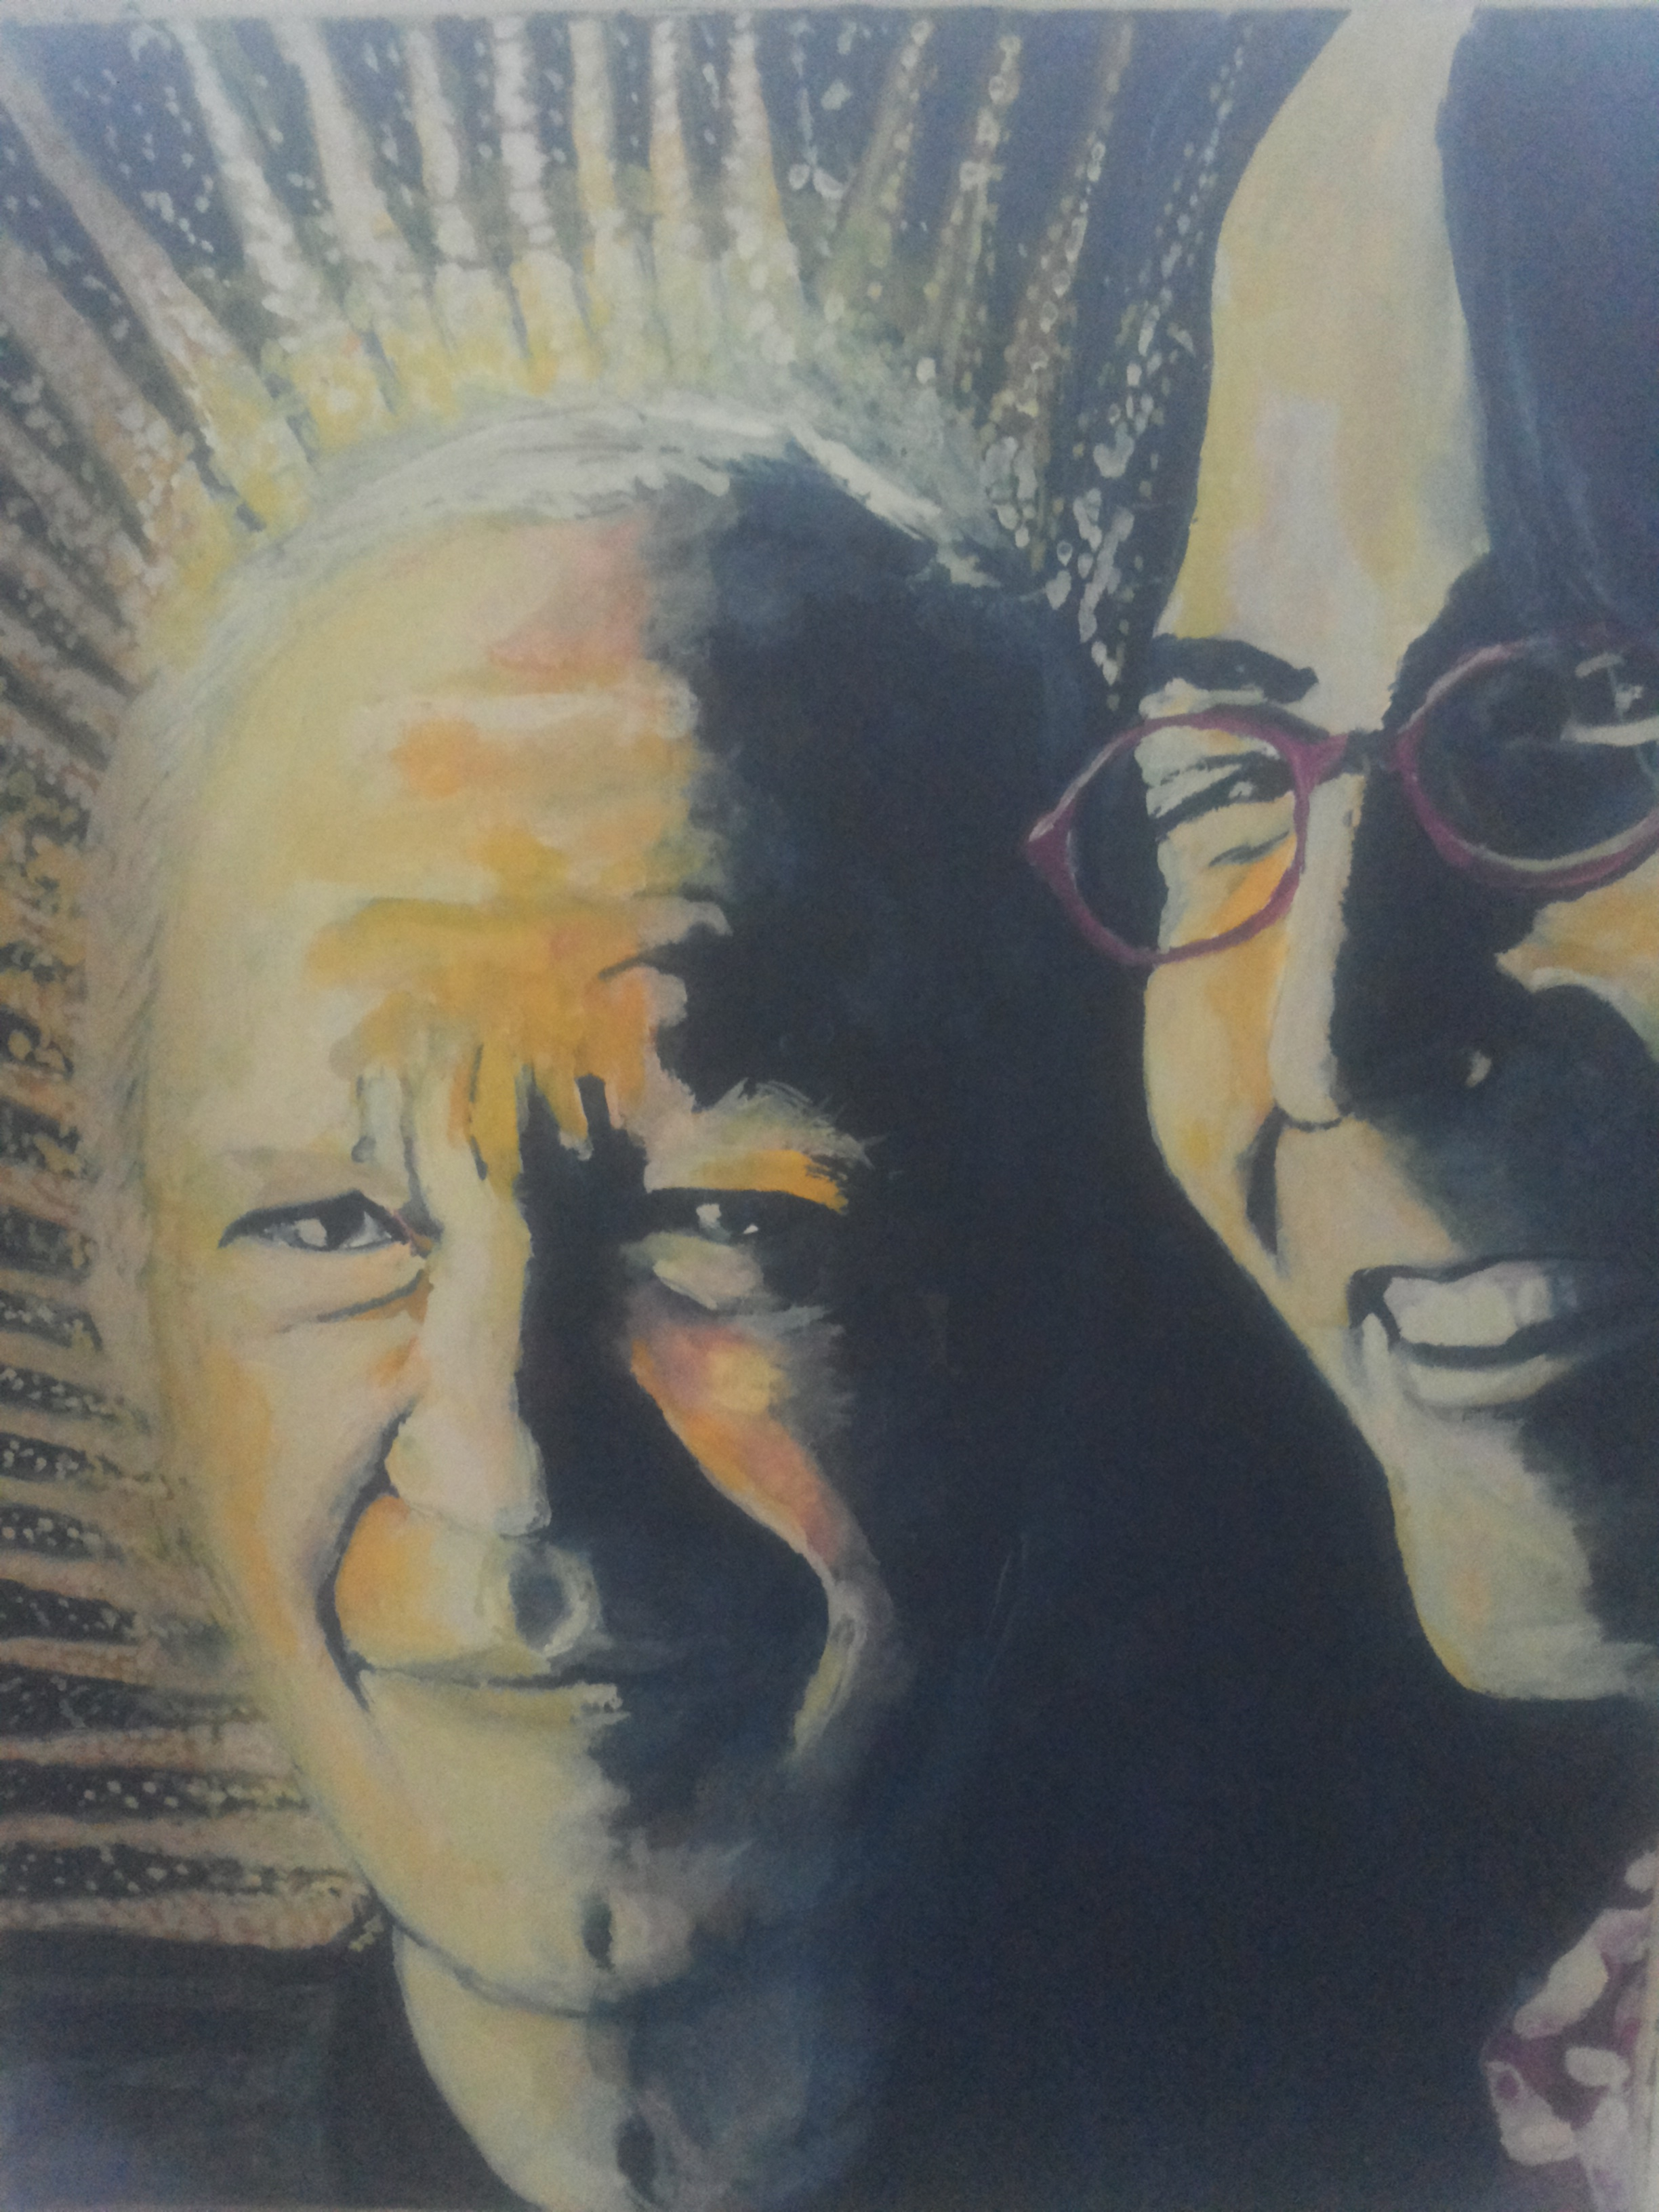 Ramses Shaffy & Bas Steman